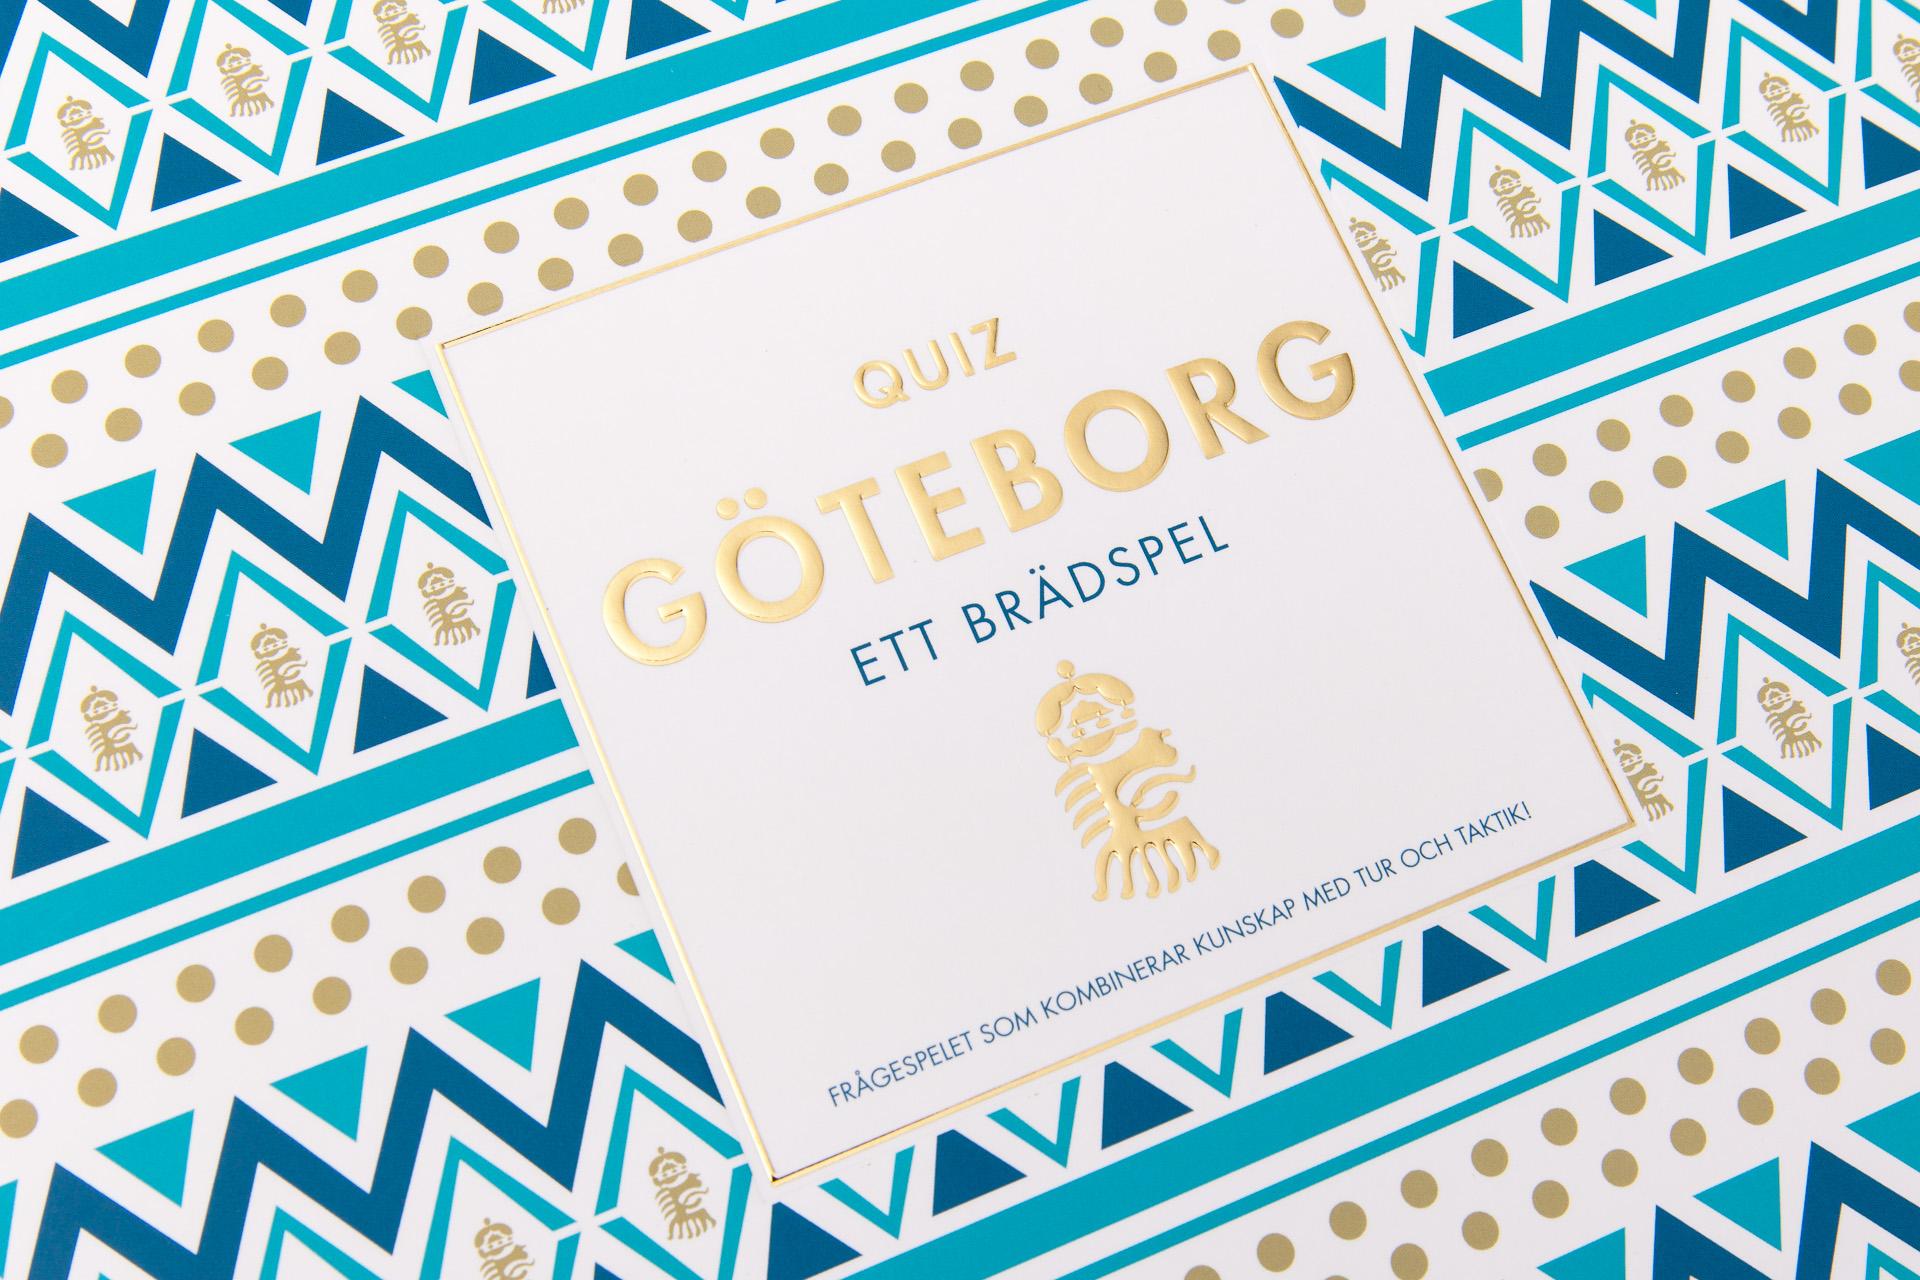 quiz-goteborg-6.jpg